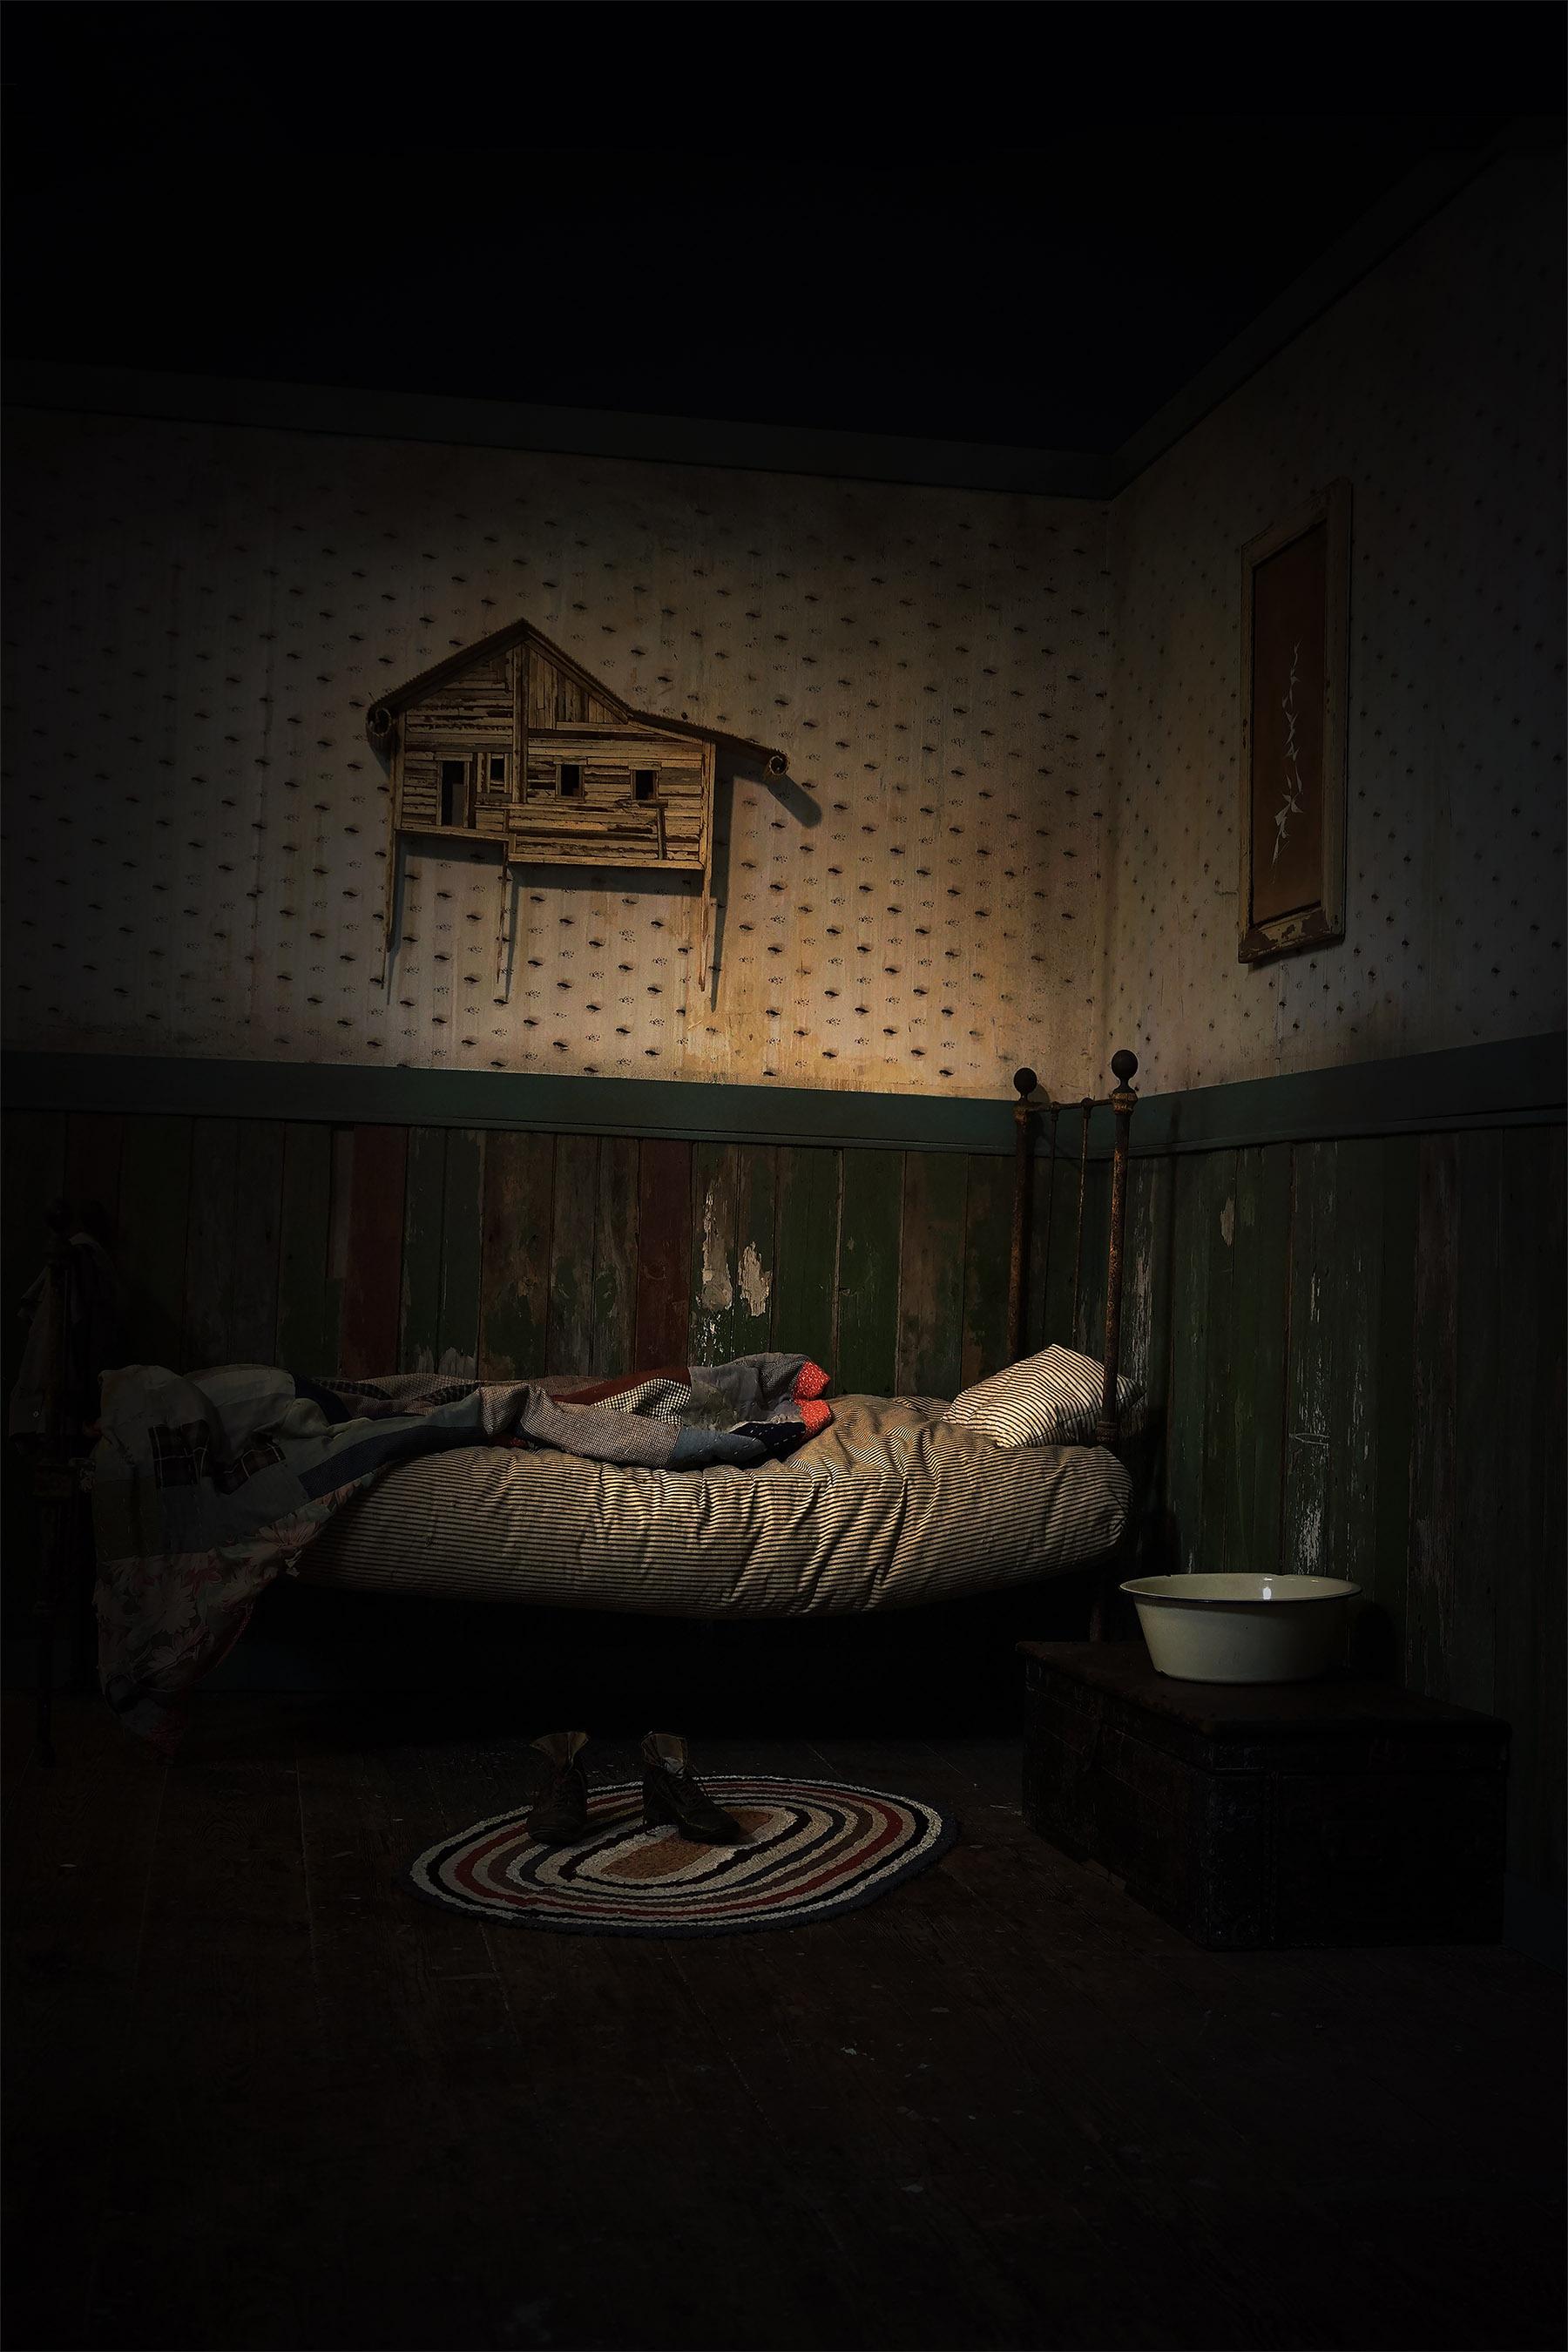 Jakes Room, Photograph/Installation, Robert Hite, 2016